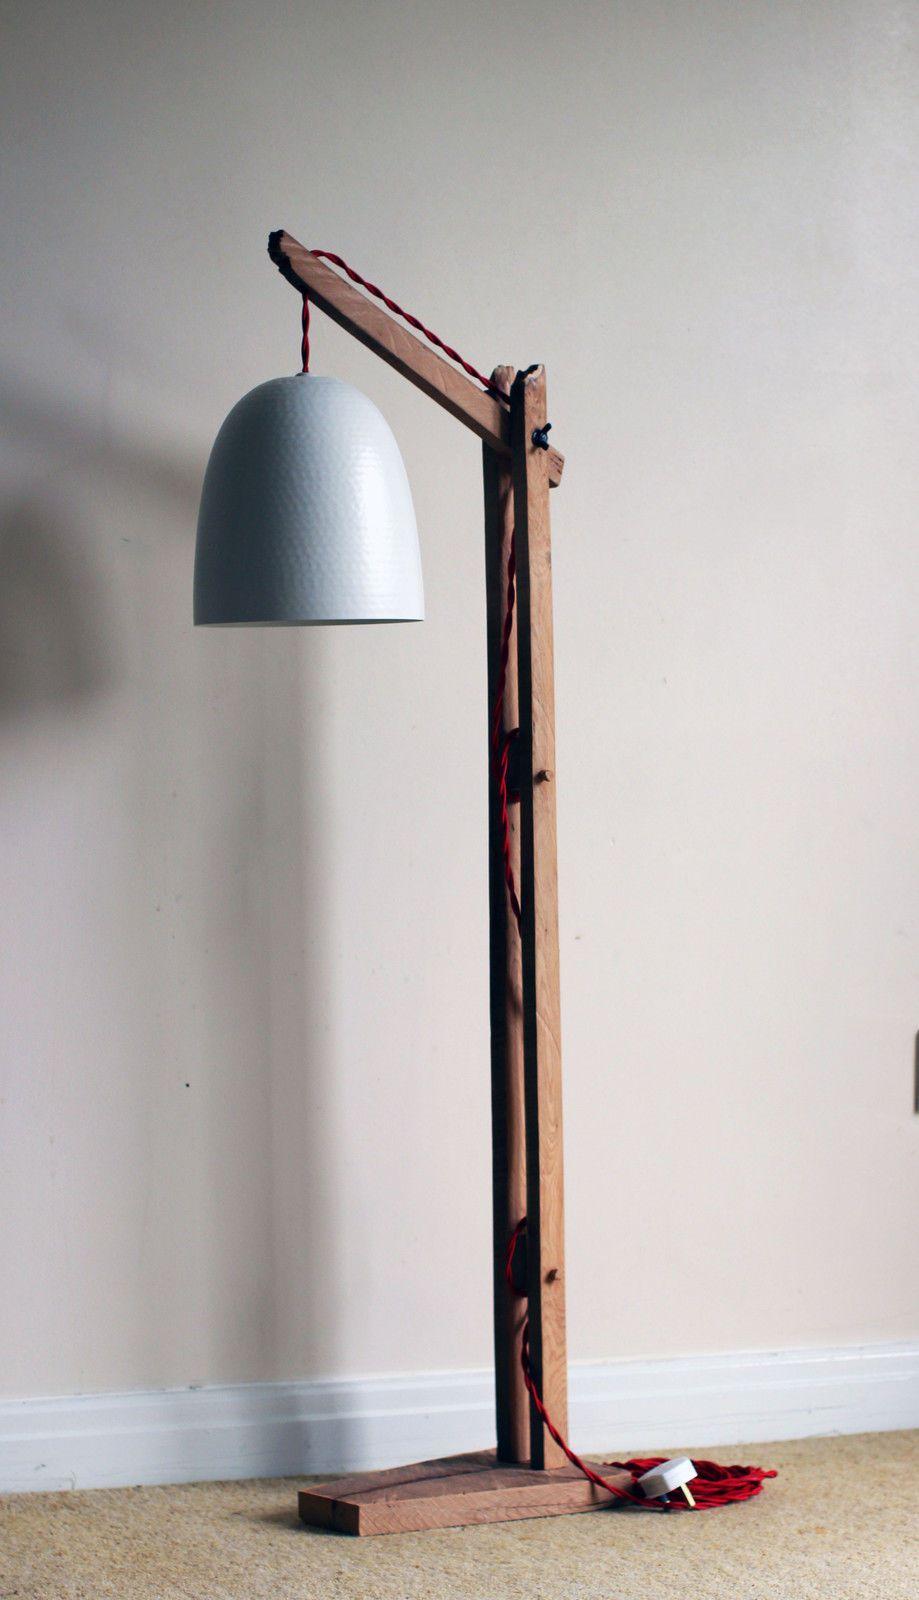 Vintage Wooden Stand Lampfloor Lamp Standing Wooden Floor pertaining to size 919 X 1600